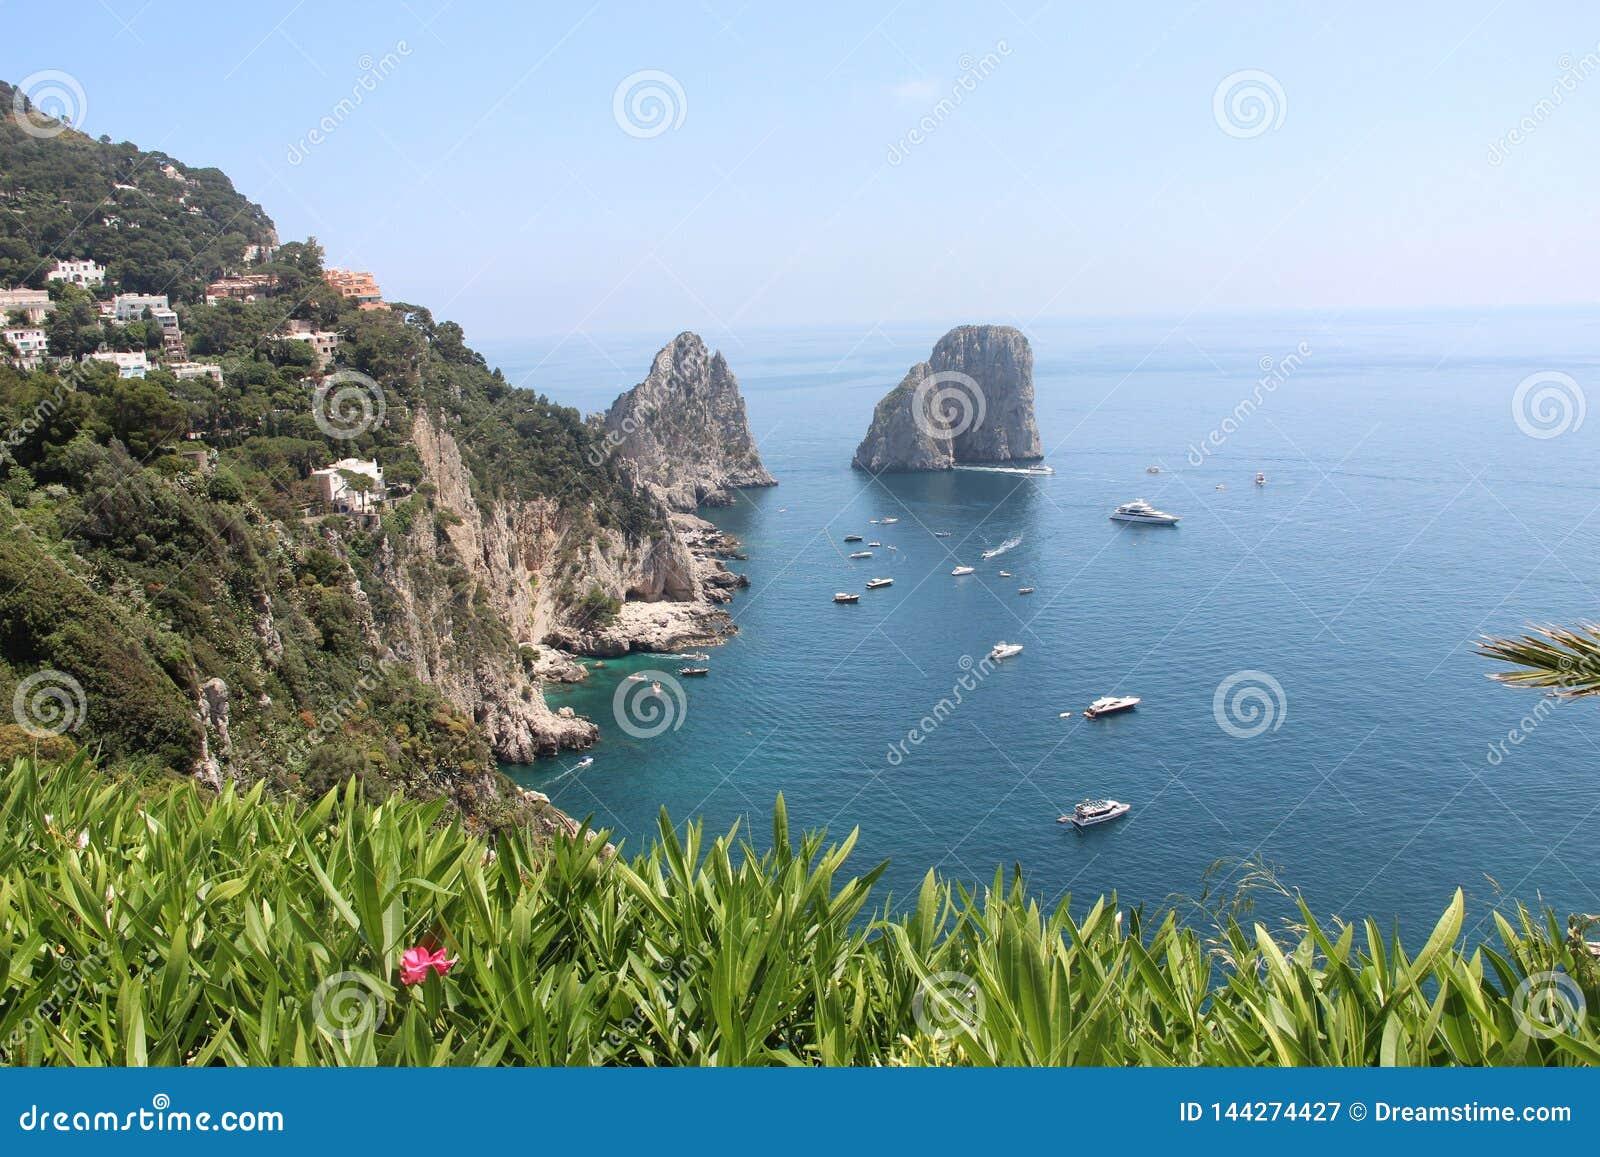 Landscape Capri island spring beautiful nature Italy